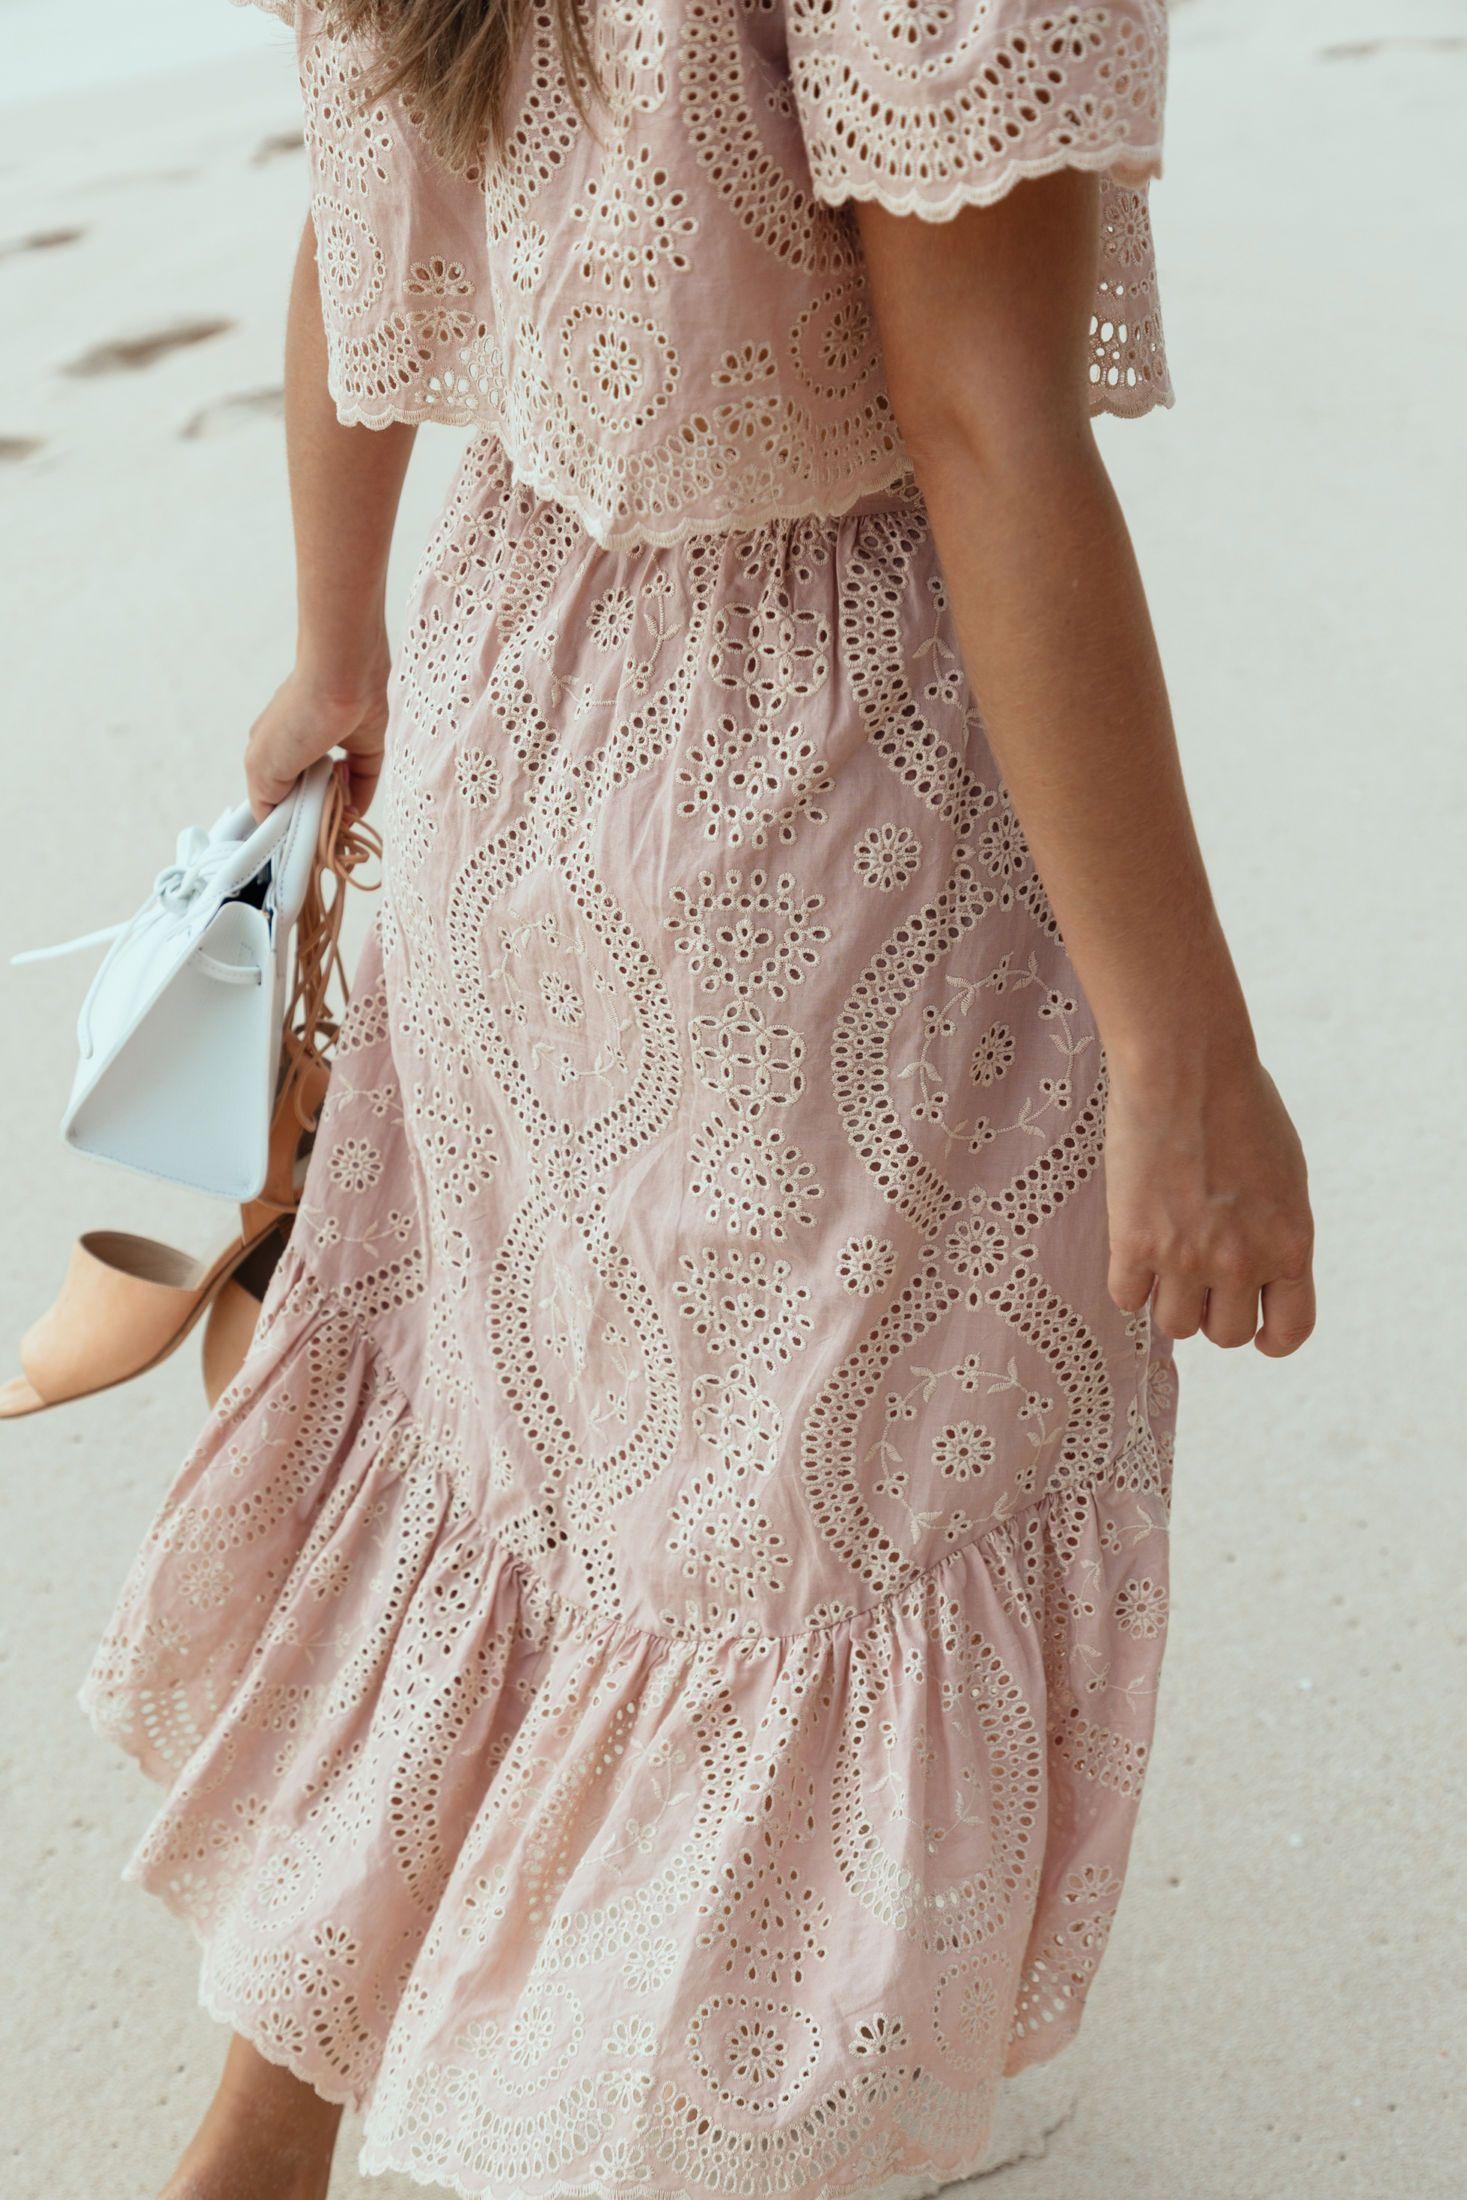 Shabby Chic Dress Boho Wedding Guest Dress Bohemian Wedding Guest Dresses [ 1000 x 800 Pixel ]